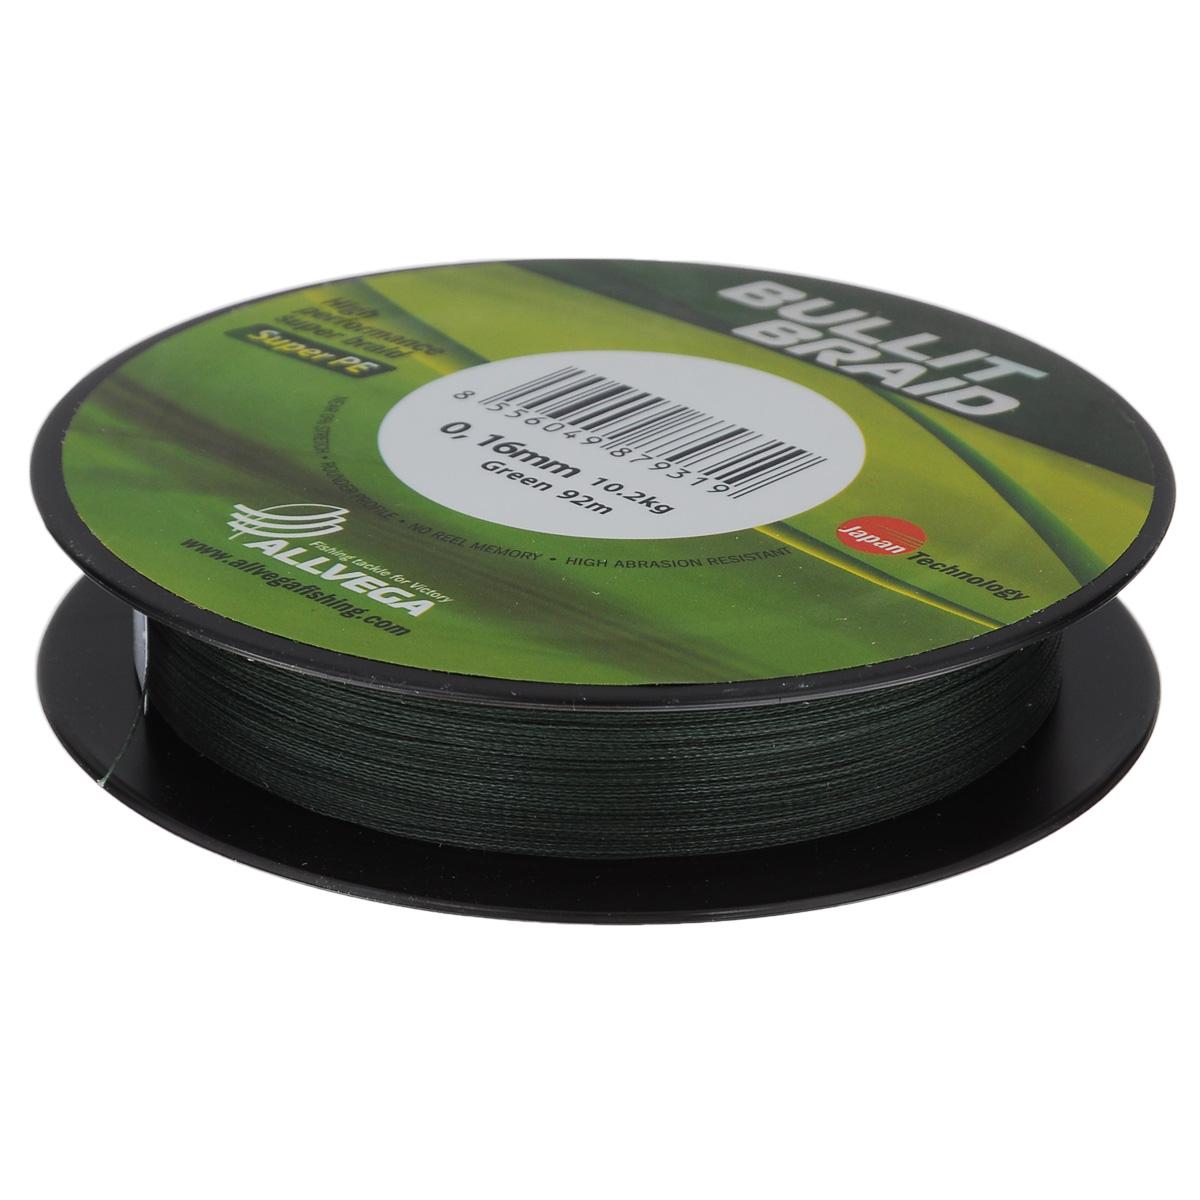 Леска плетеная Allvega Bullit Braid, цвет: темно-зеленый, 92 м, 0,16 мм, 10,2 кг